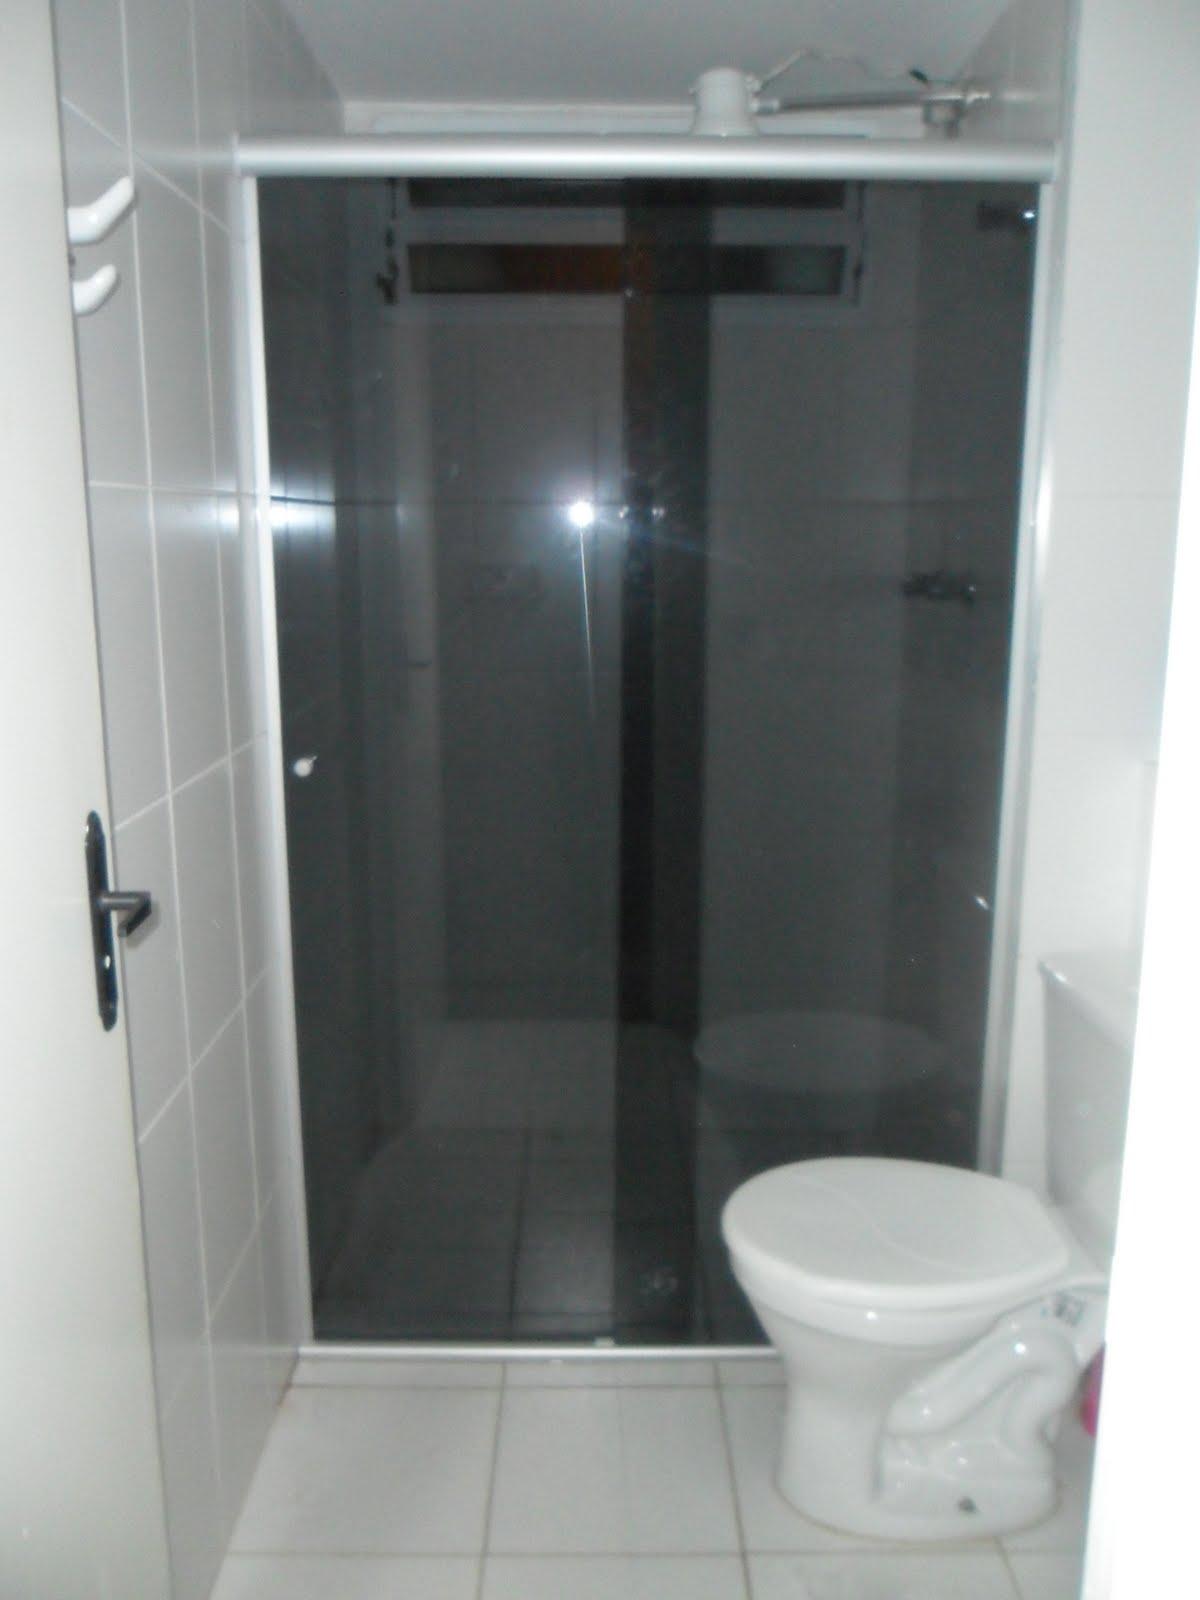 VIDRAÇARIA KITO: . BOX DE VIDRO TEMPERADO #5C676F 1200x1600 Banheiro Branco Fosco